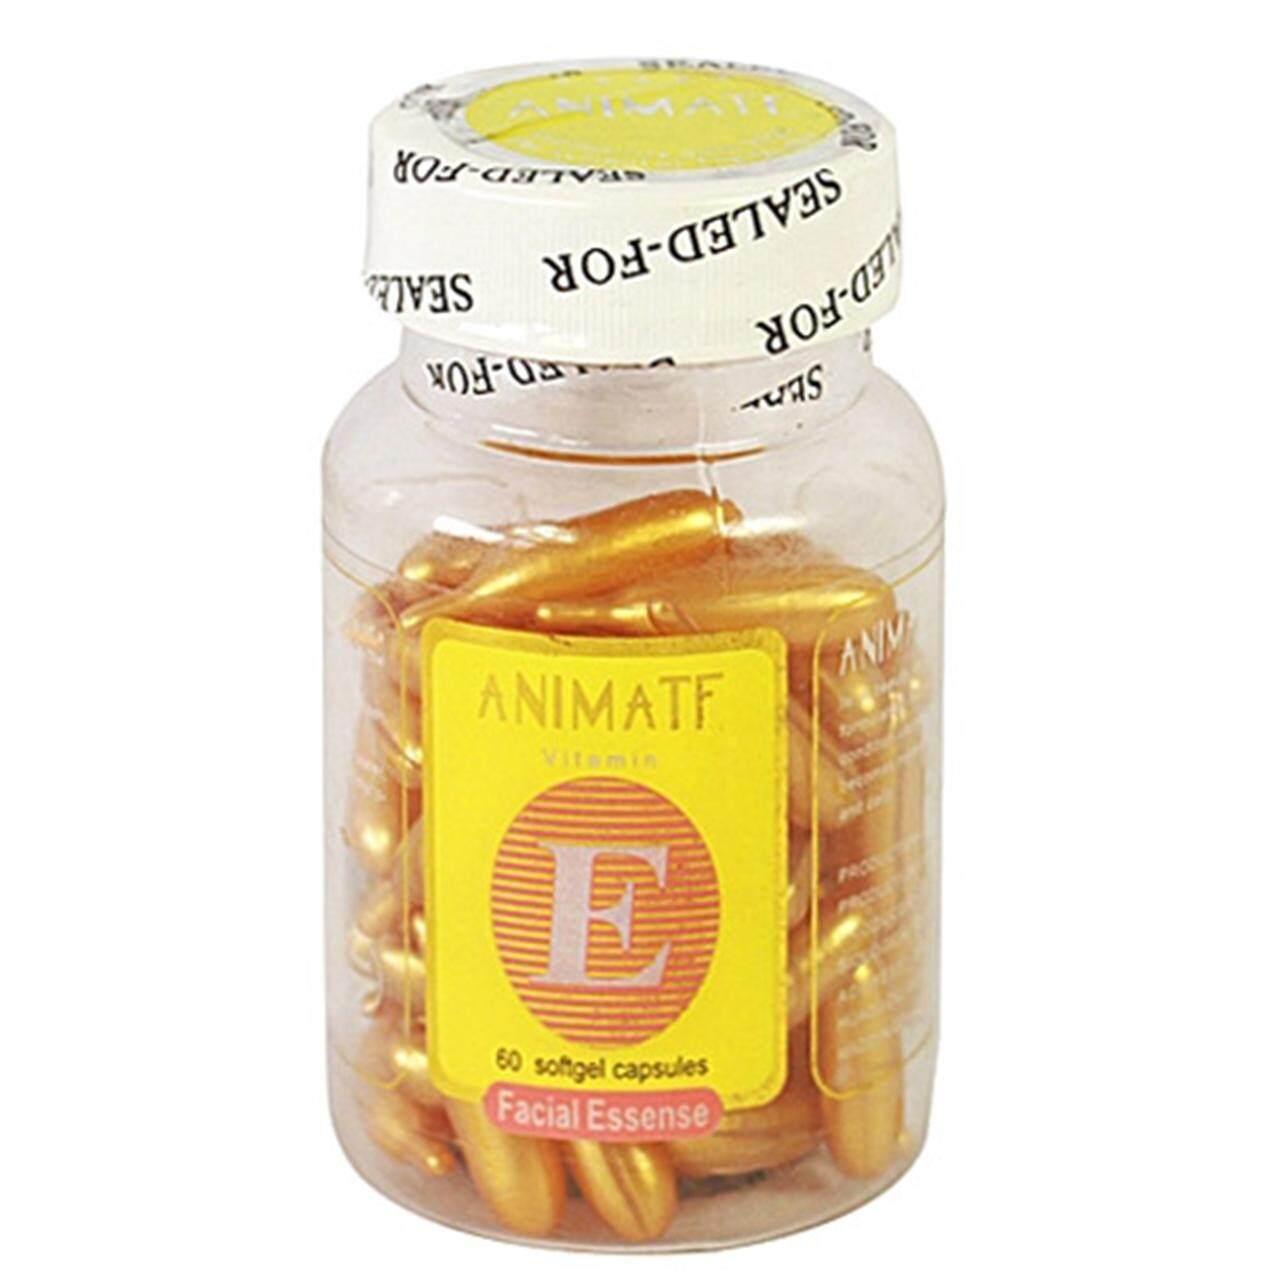 Animate Facial Essense Vitamin E เซรั่มวิตามิน E หน้าใส ไร้ริ้วรอย บรรจุ 60 แคปซูล (1 กระปุก ).